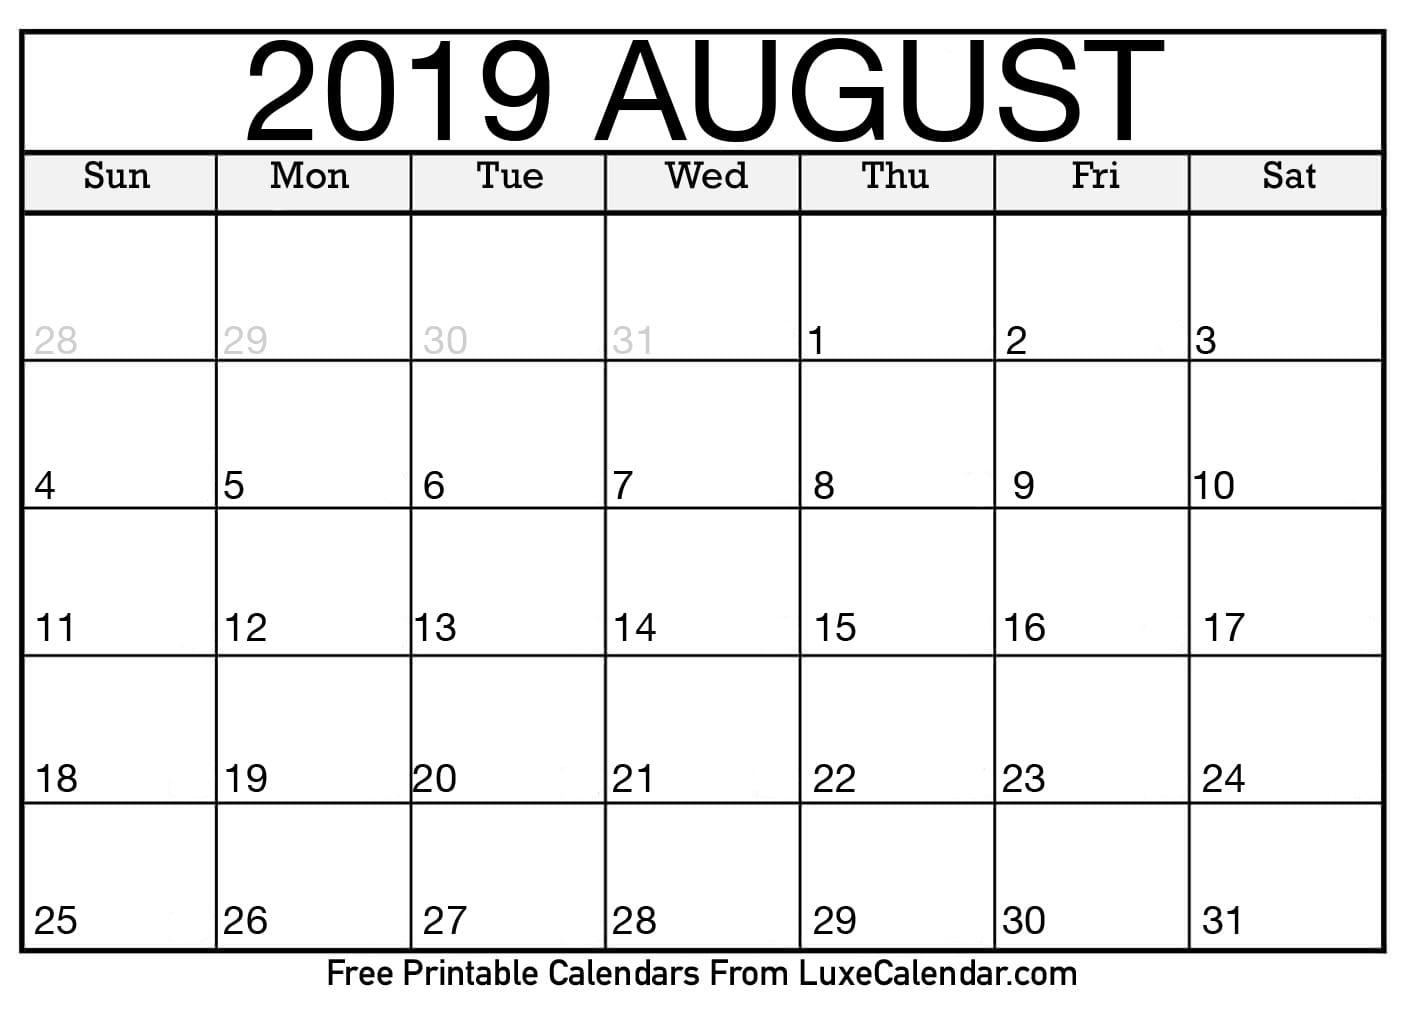 Blank August 2019 Calendar Template - Printable Calendar 2019| Blank regarding August Calendar Template Printable